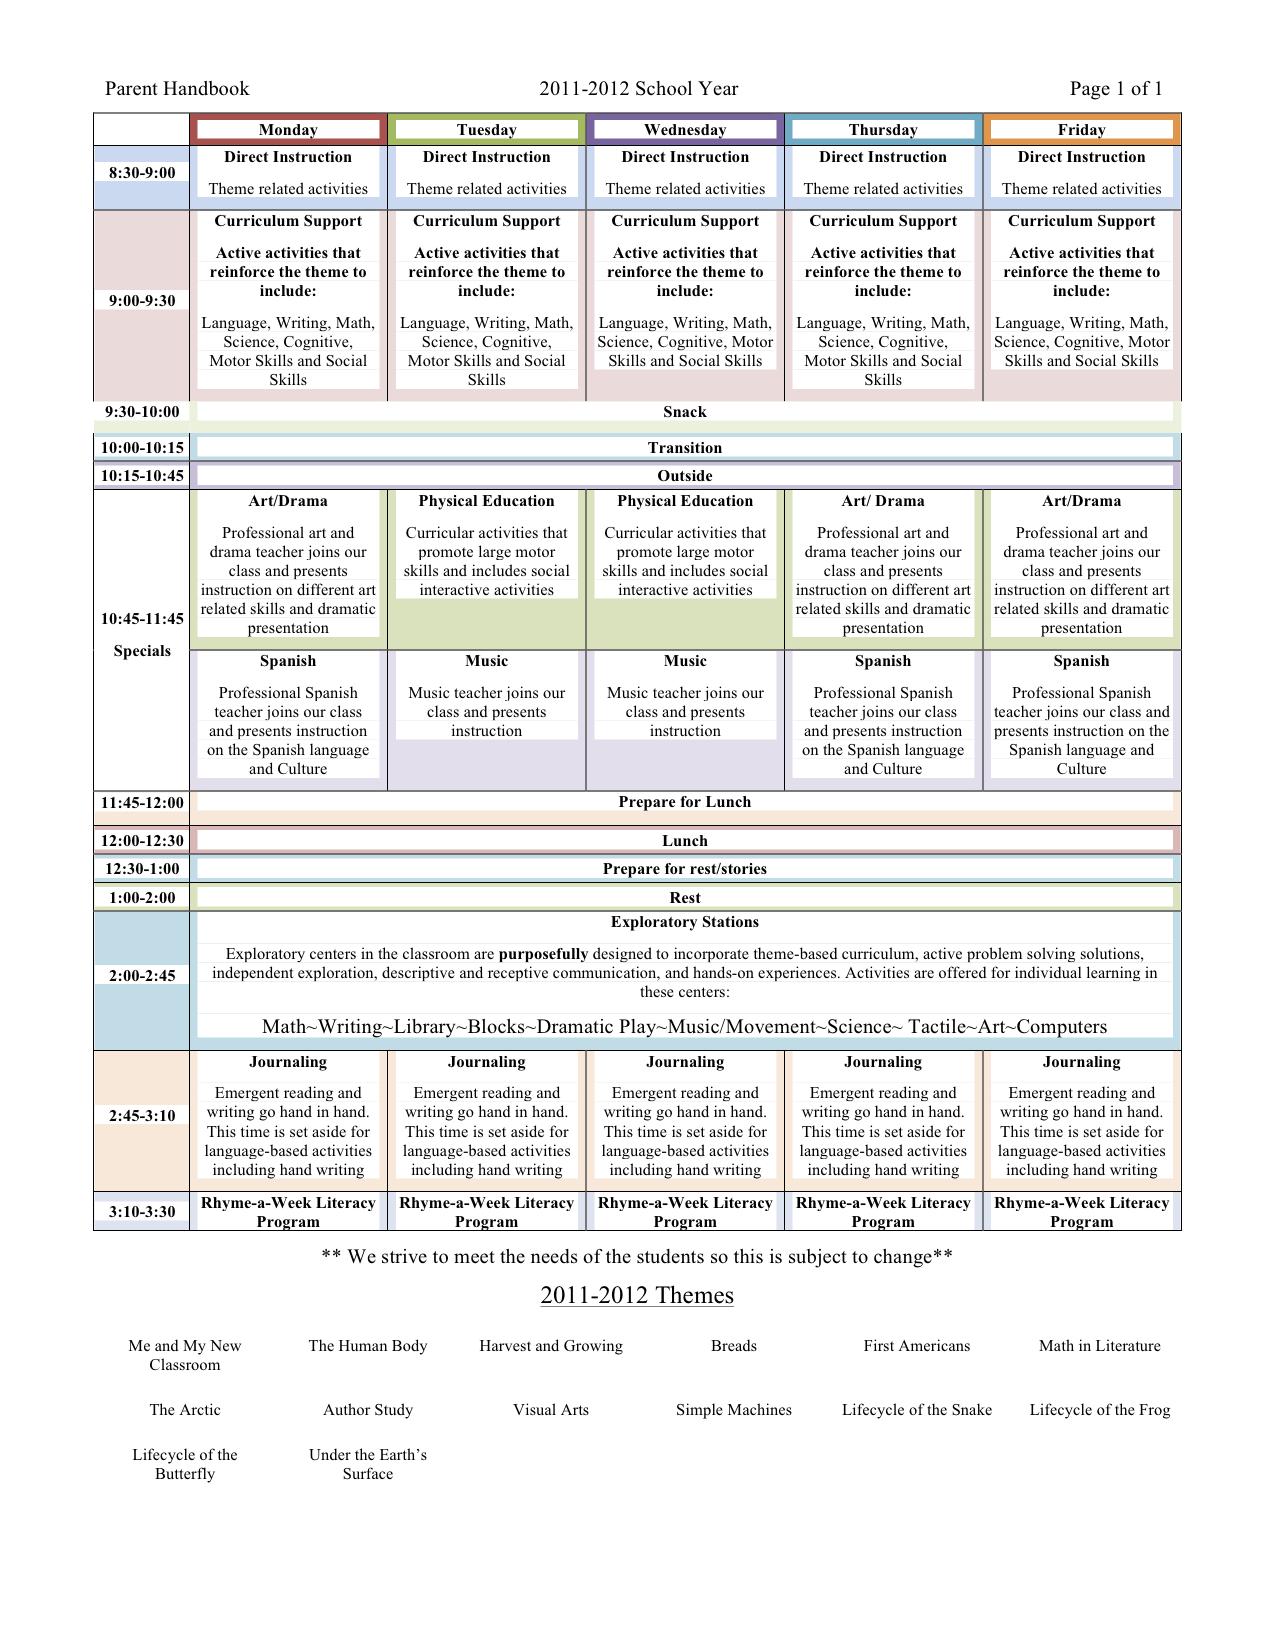 Preschool Daily Schedule Lesson Plan